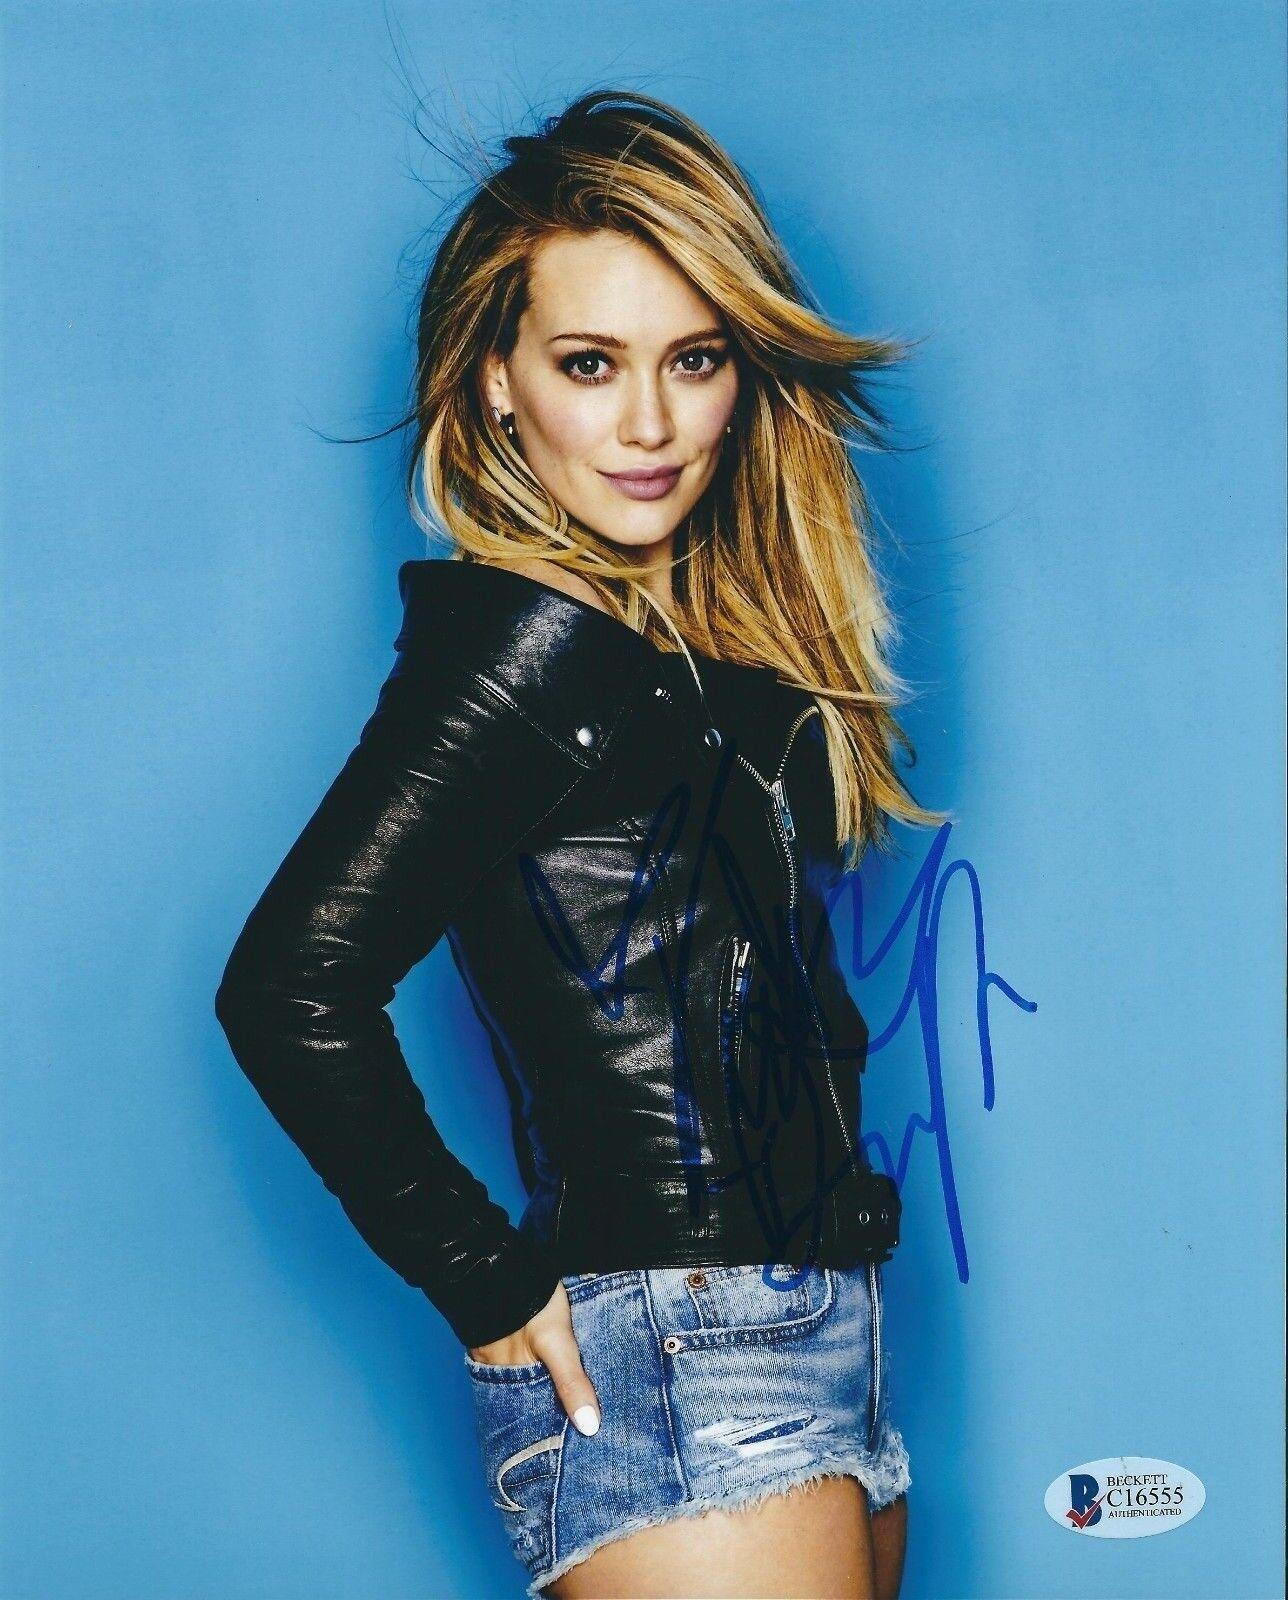 Hillary Duff Signed 8x10 Photo Beckett *Disney *Model *Actress C16555